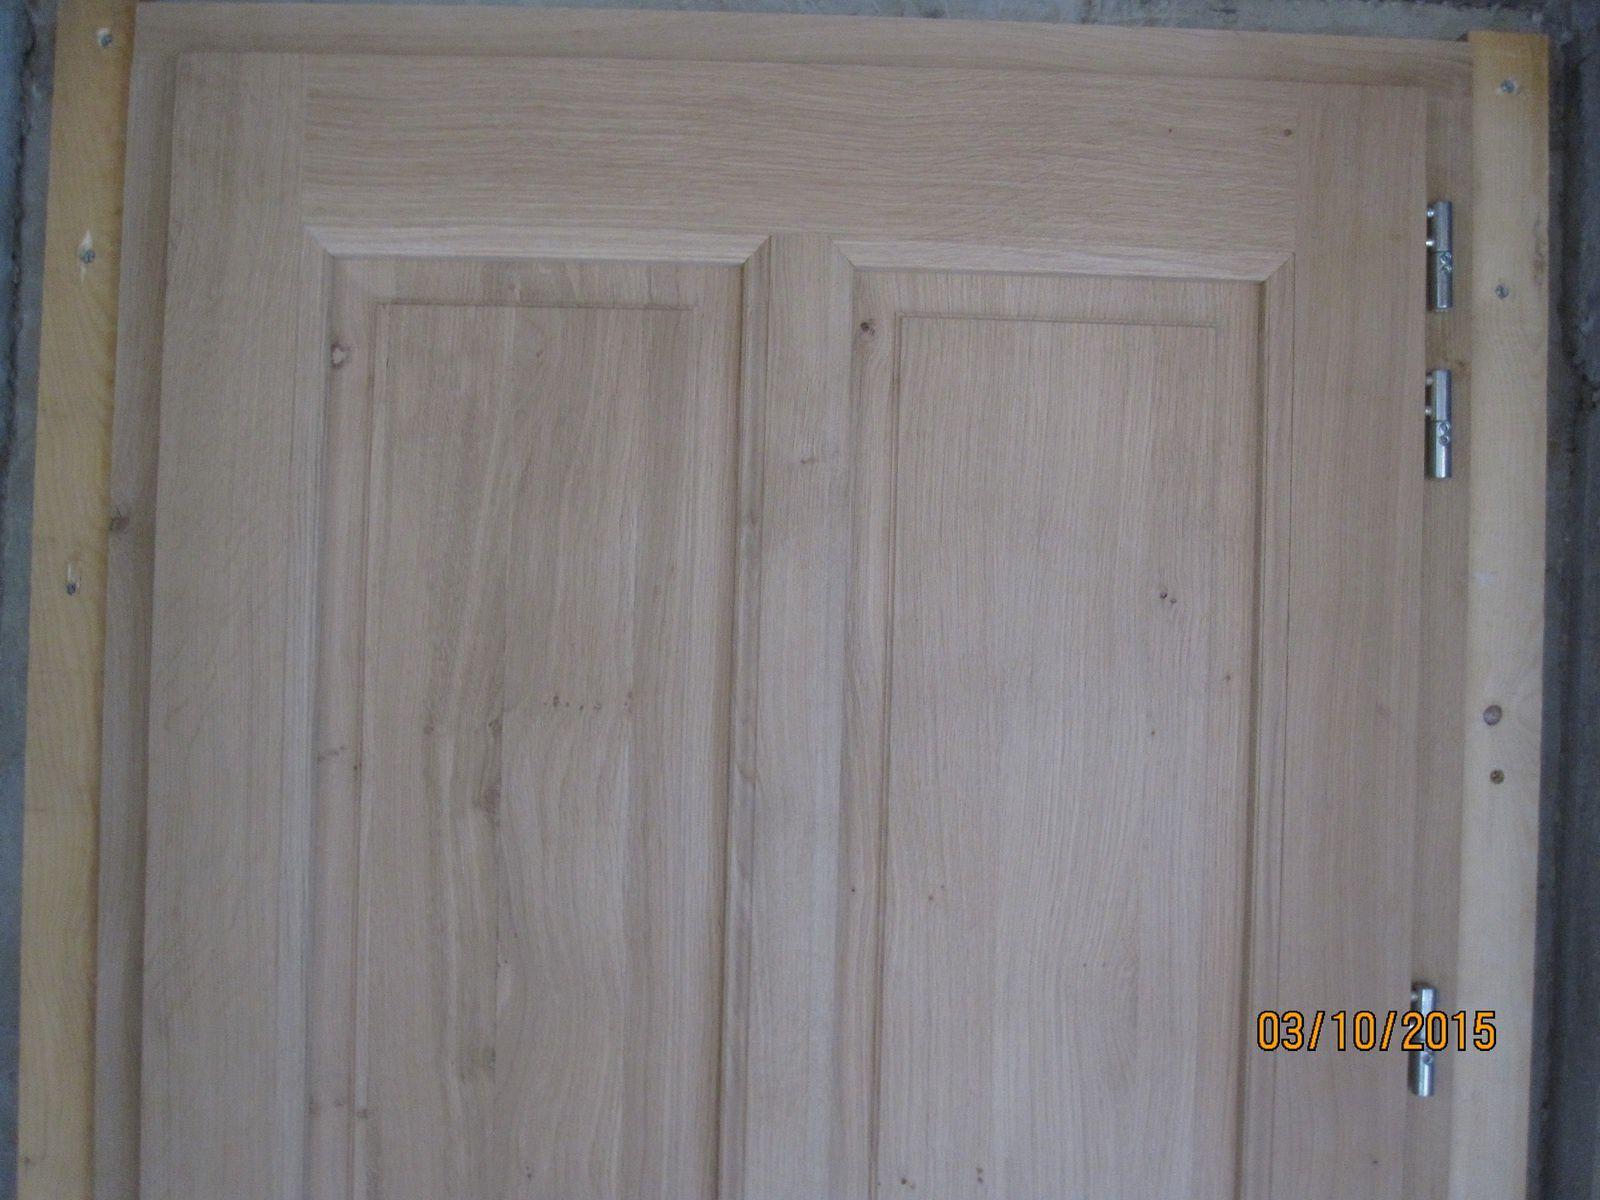 Porte de service bois sur mesure for Porte chene massif castorama